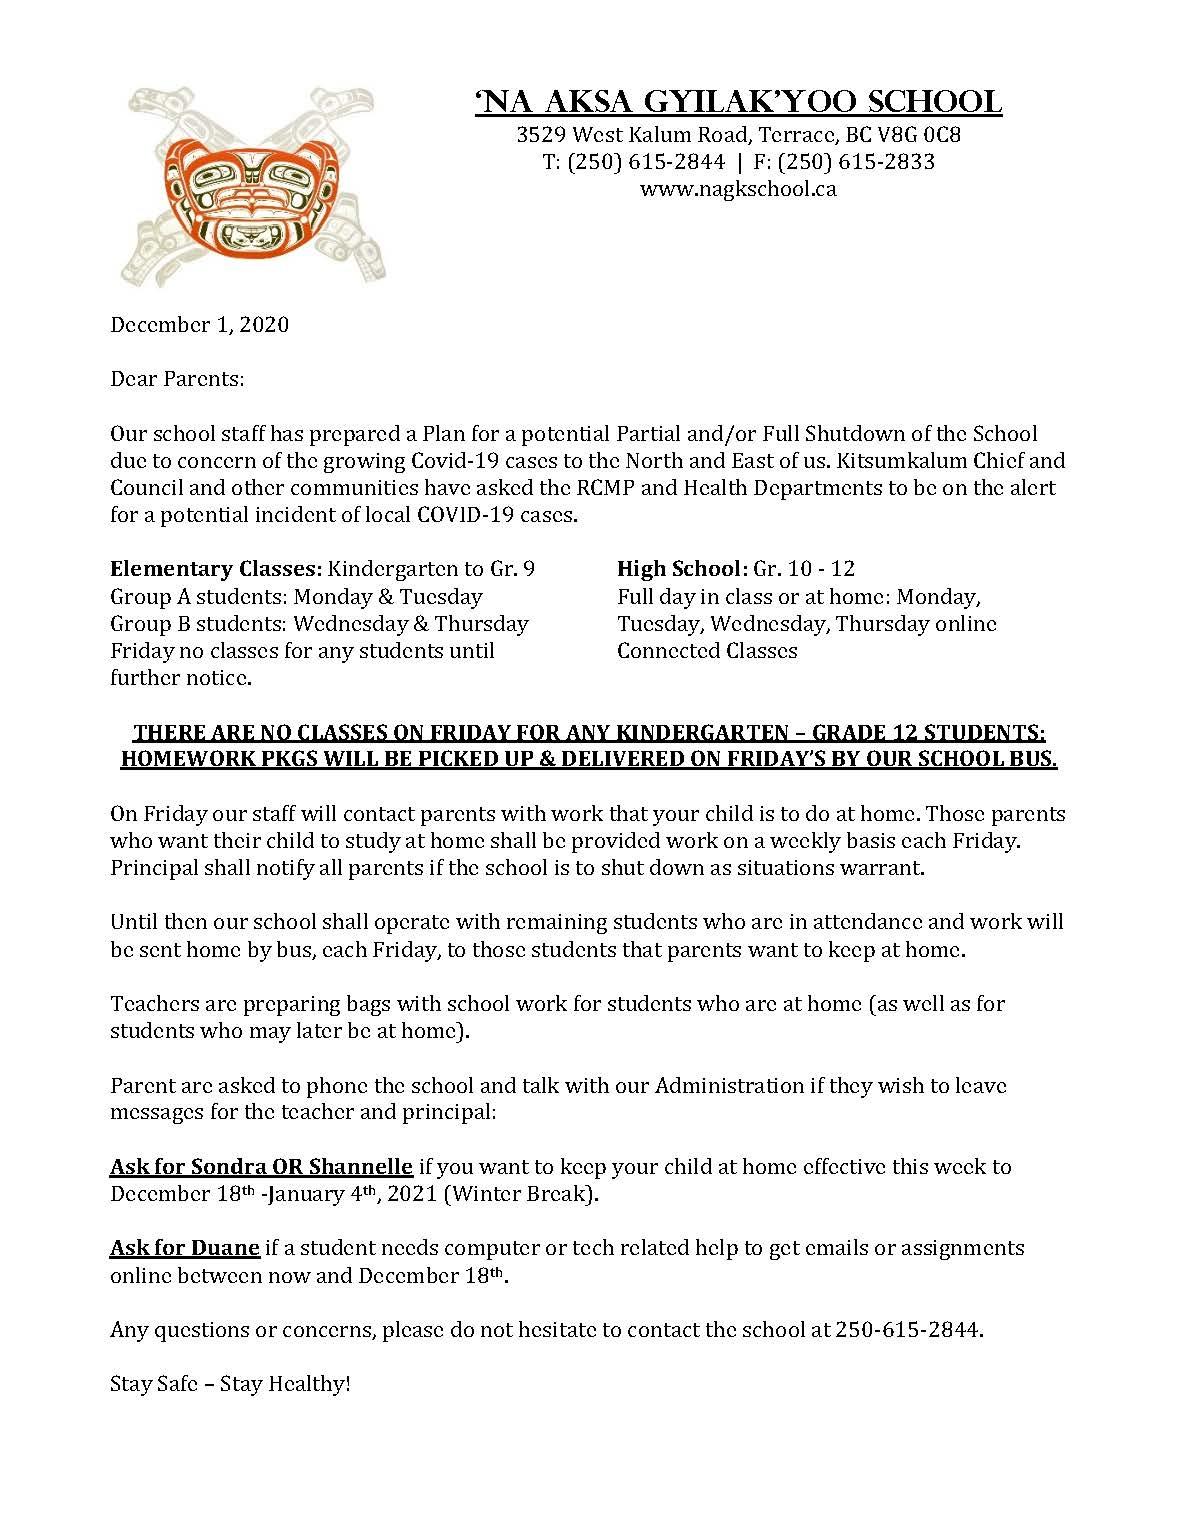 Letter to Parents December 1, 2020